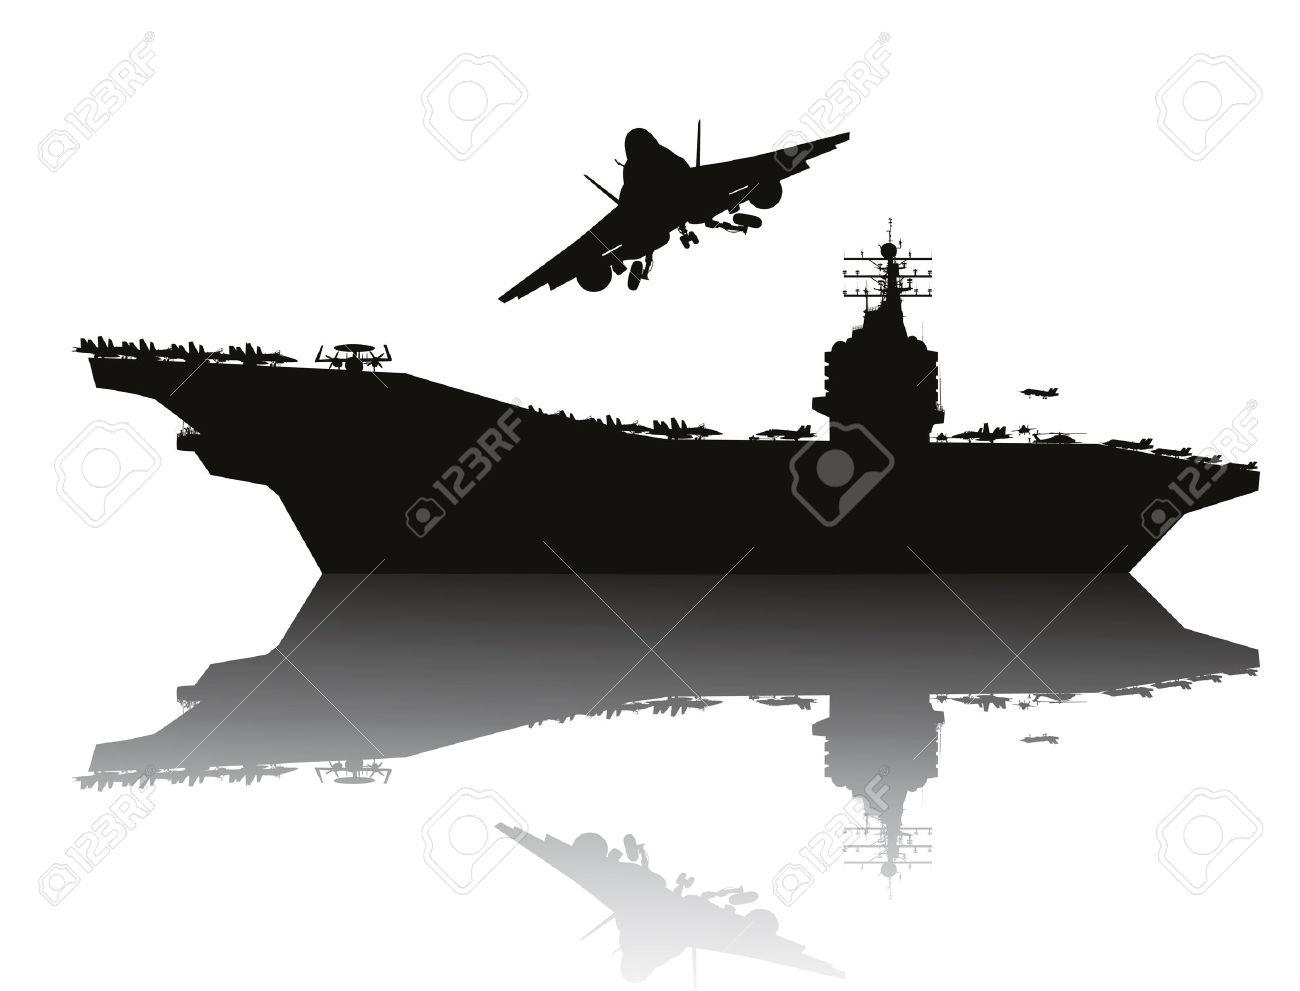 706 Battleship Cliparts, Stock Vector And Royalty Free Battleship ...